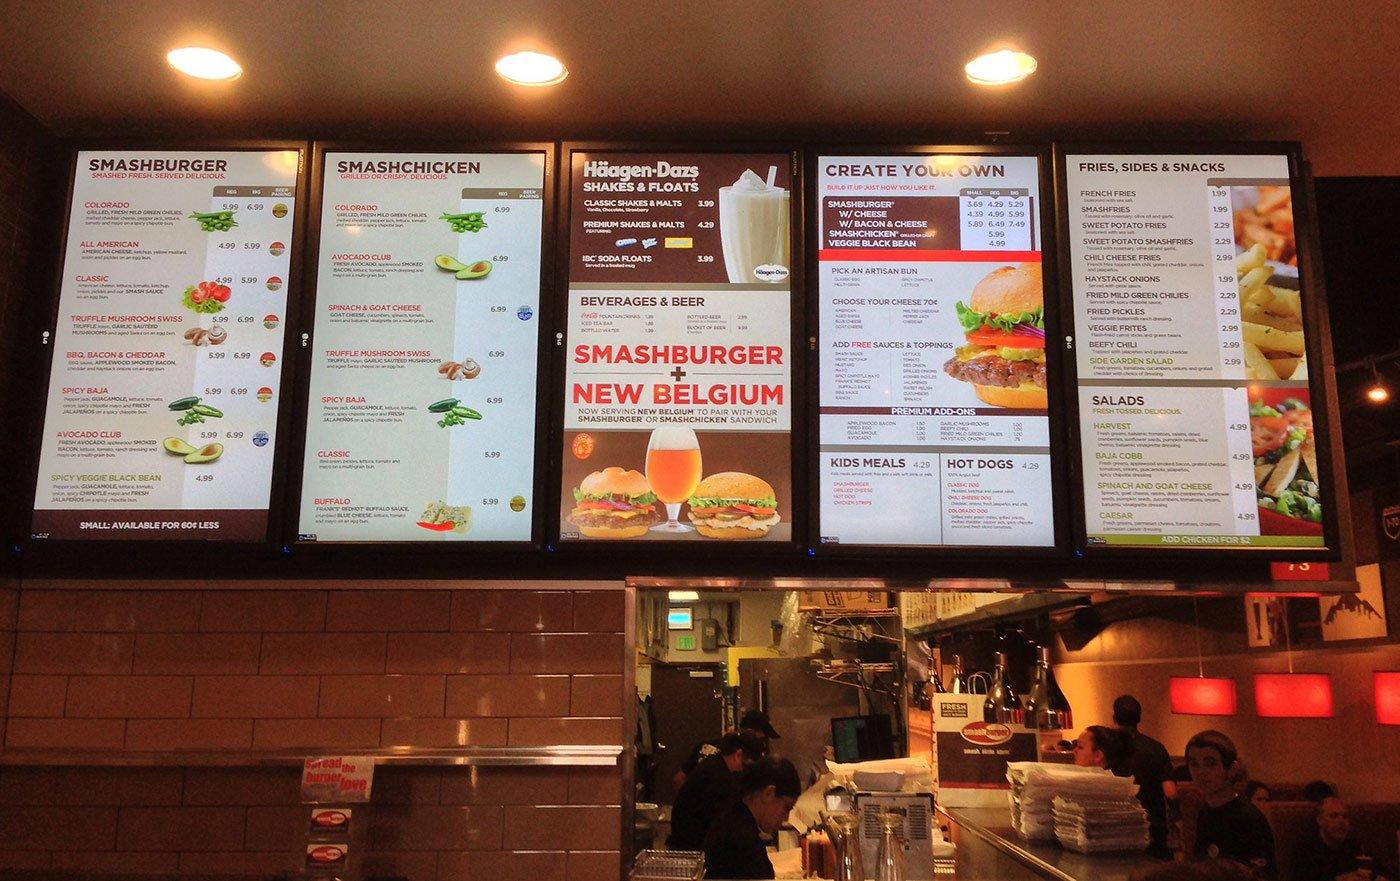 Excellent Restaurant Digital Signage